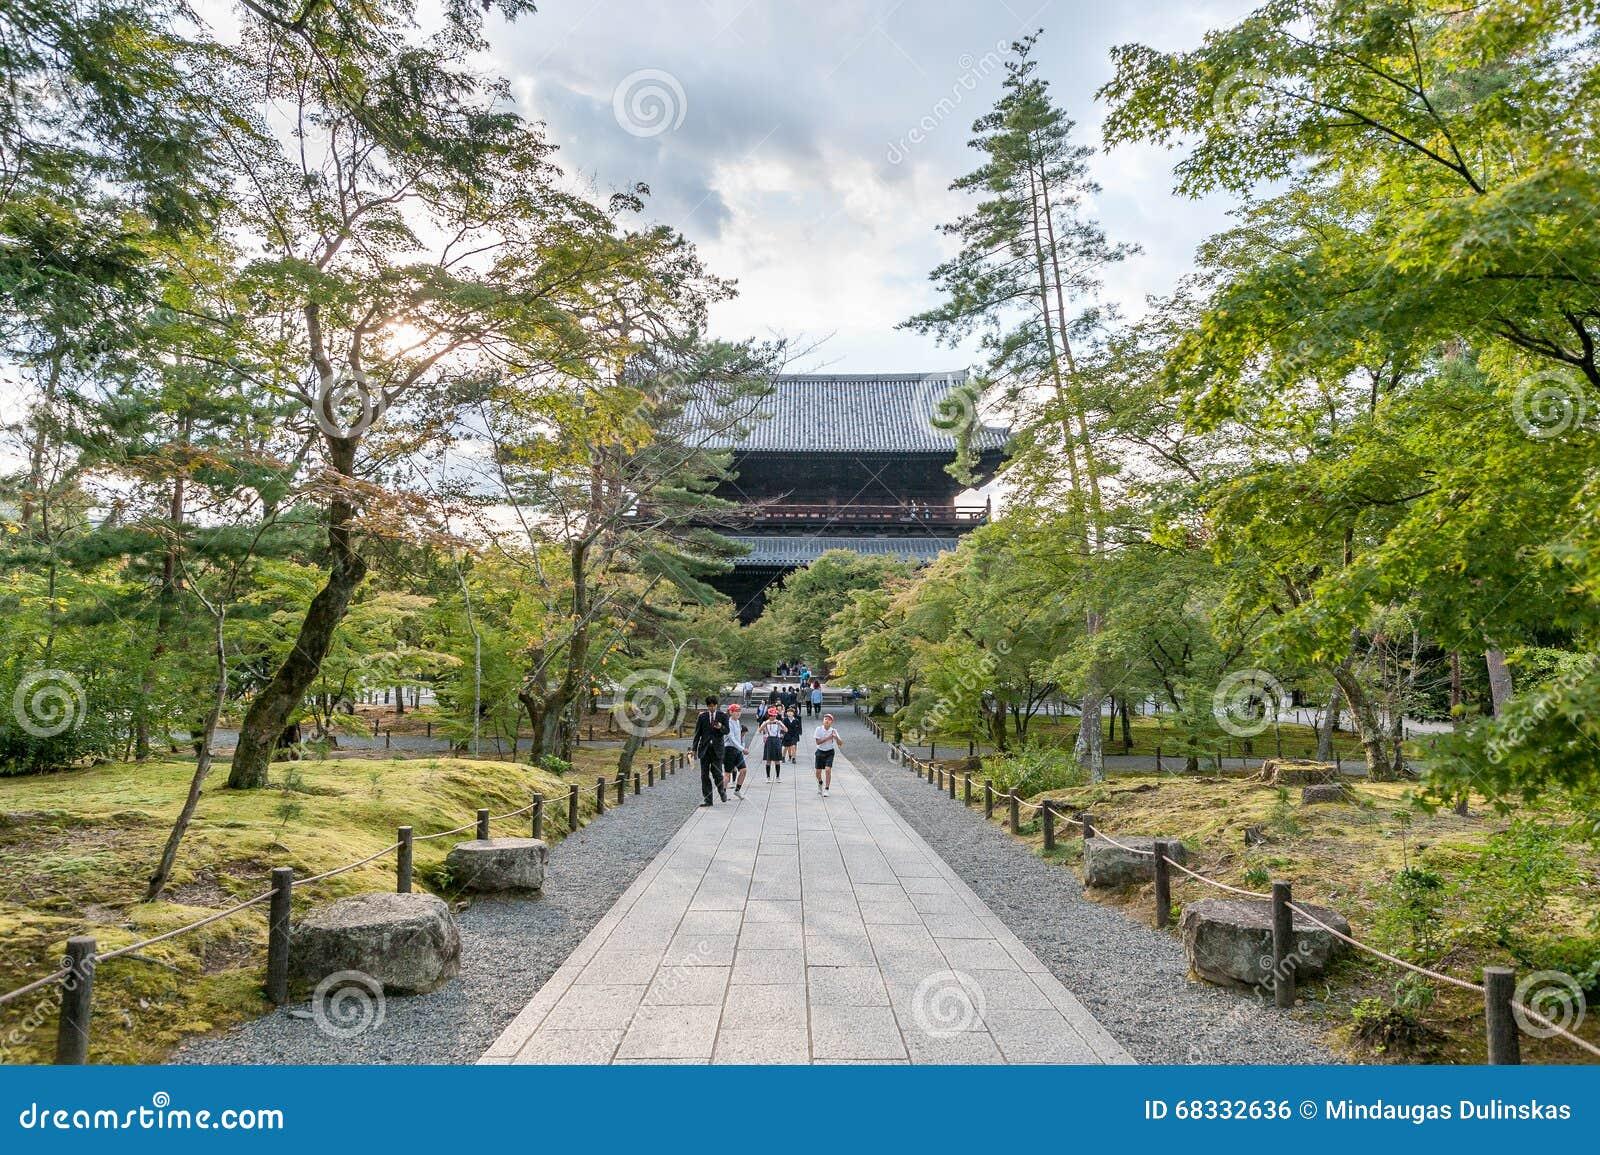 KYOTO, JAPAN - OCTOBER 08, 2015: Nanzen-ji, Zuiryusan Nanzen